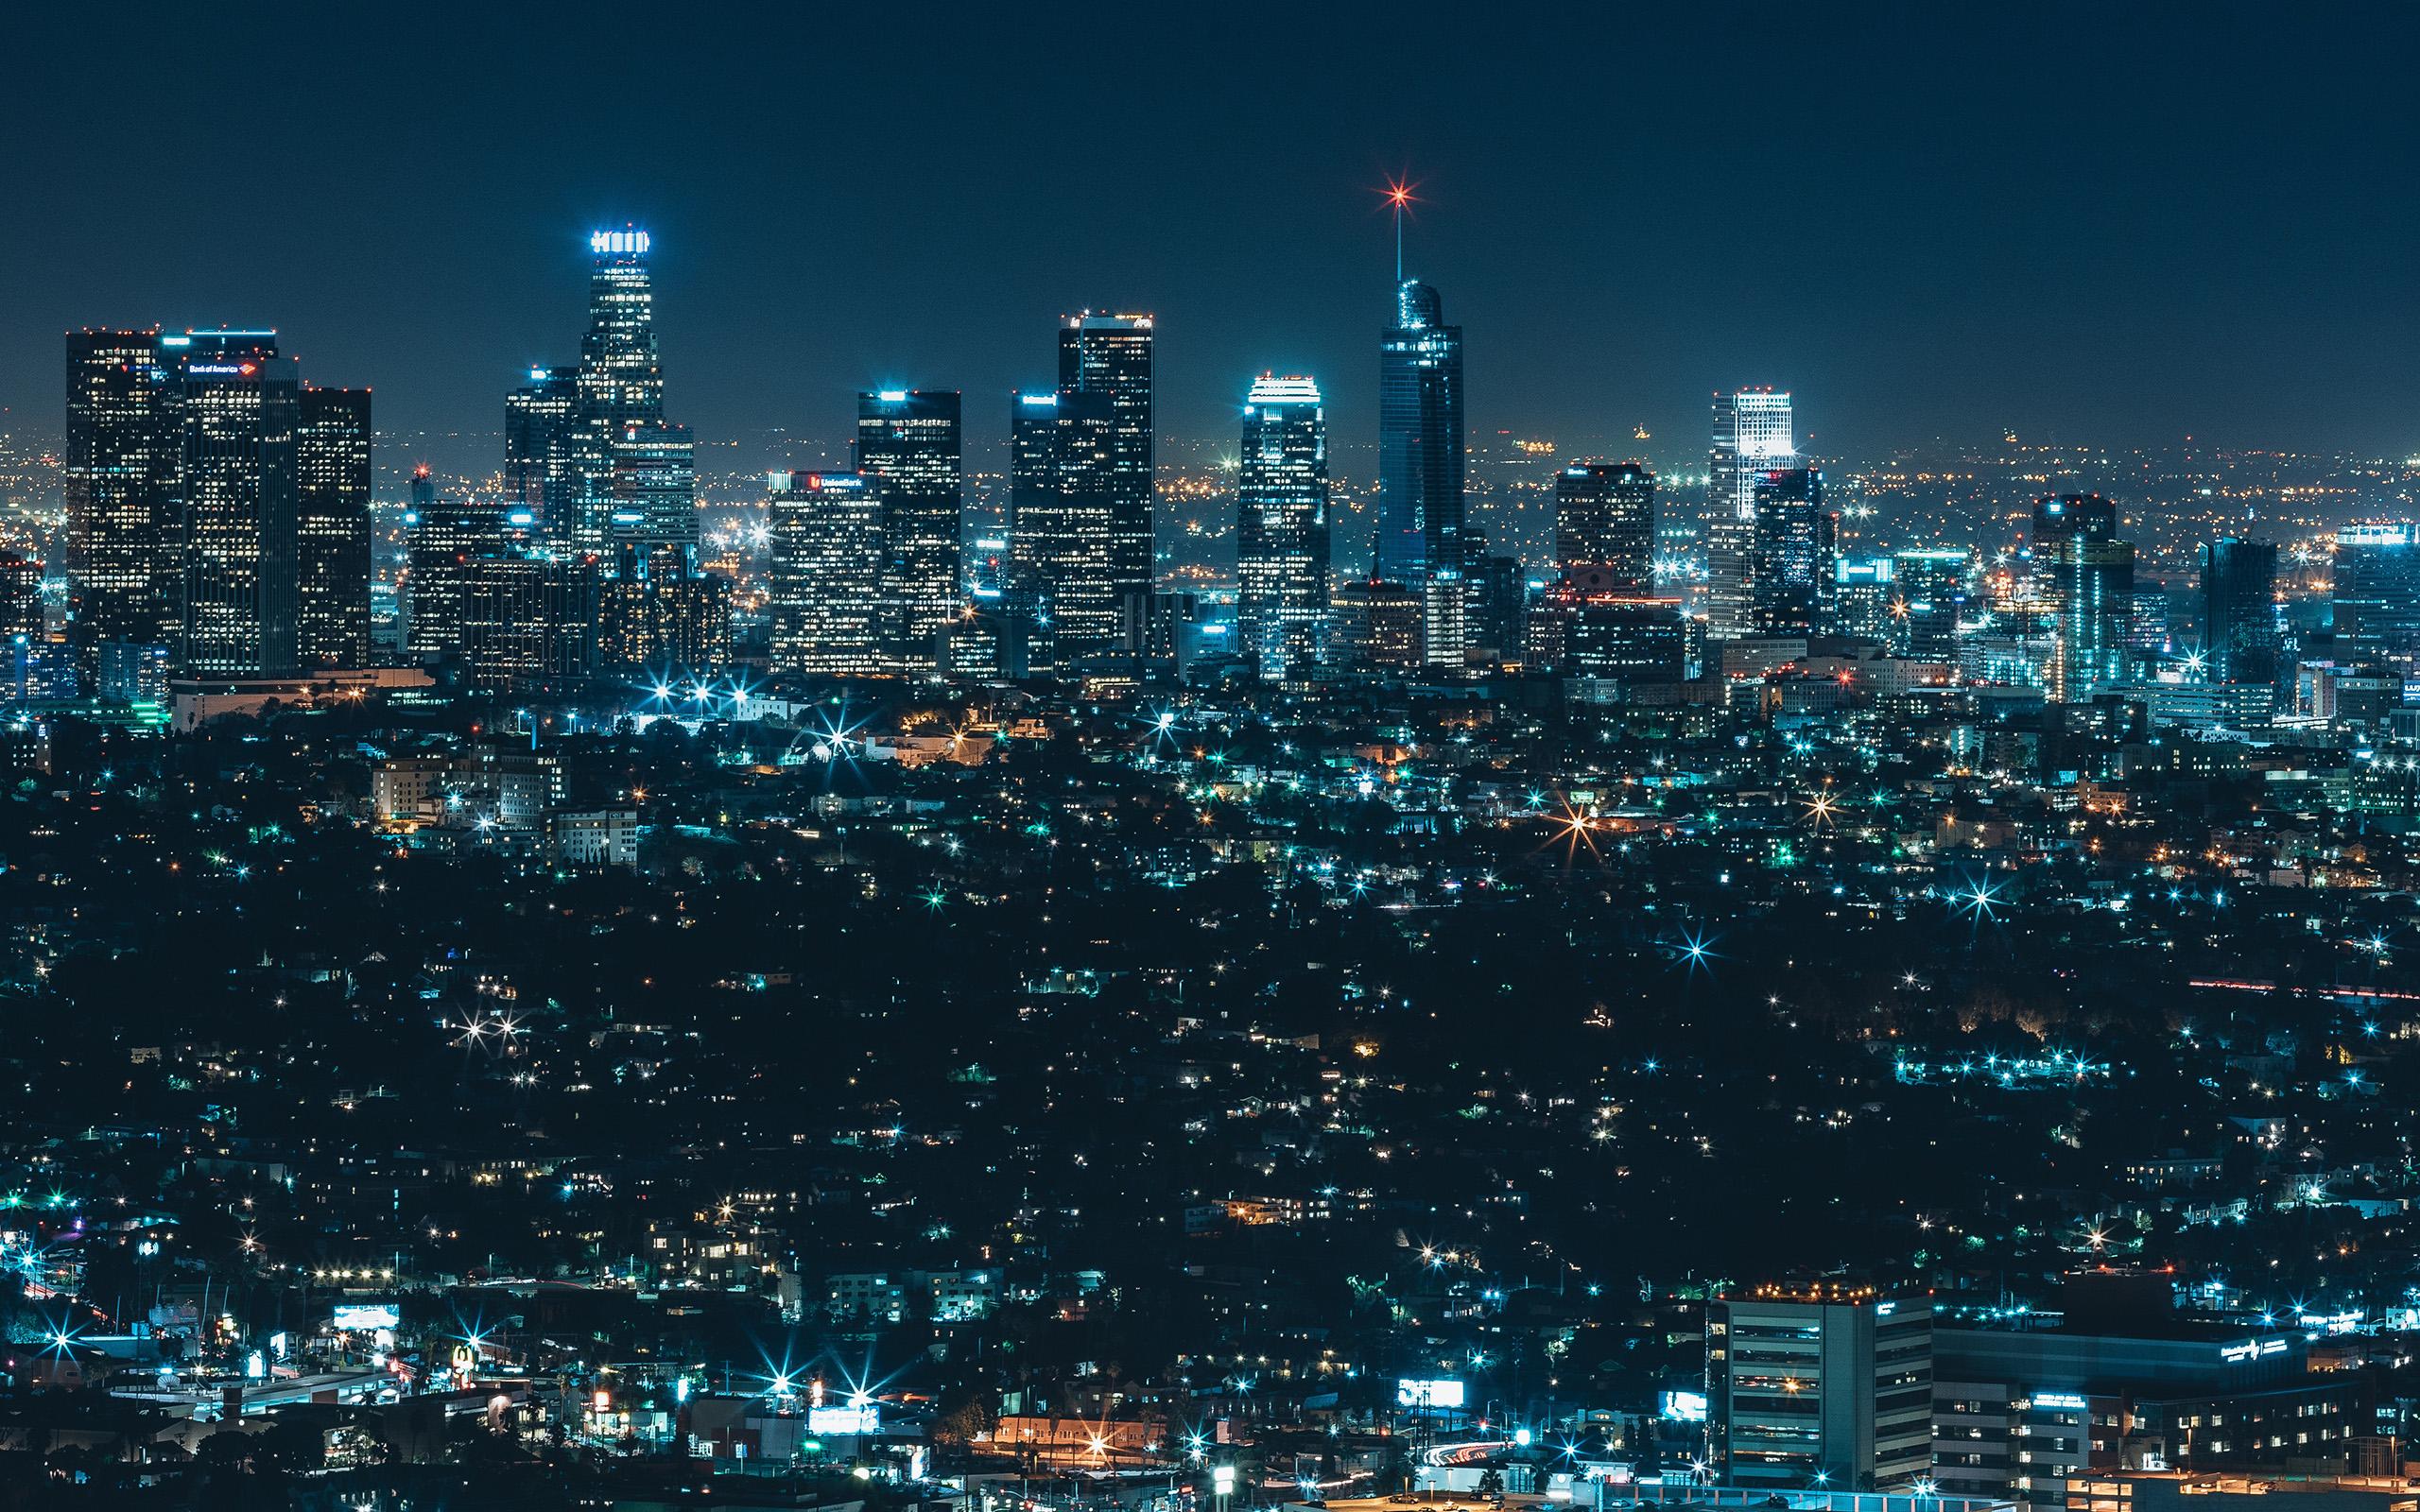 1080×2400 wallpaper: No12-city-view-night-architecture-building-dark-wallpaper